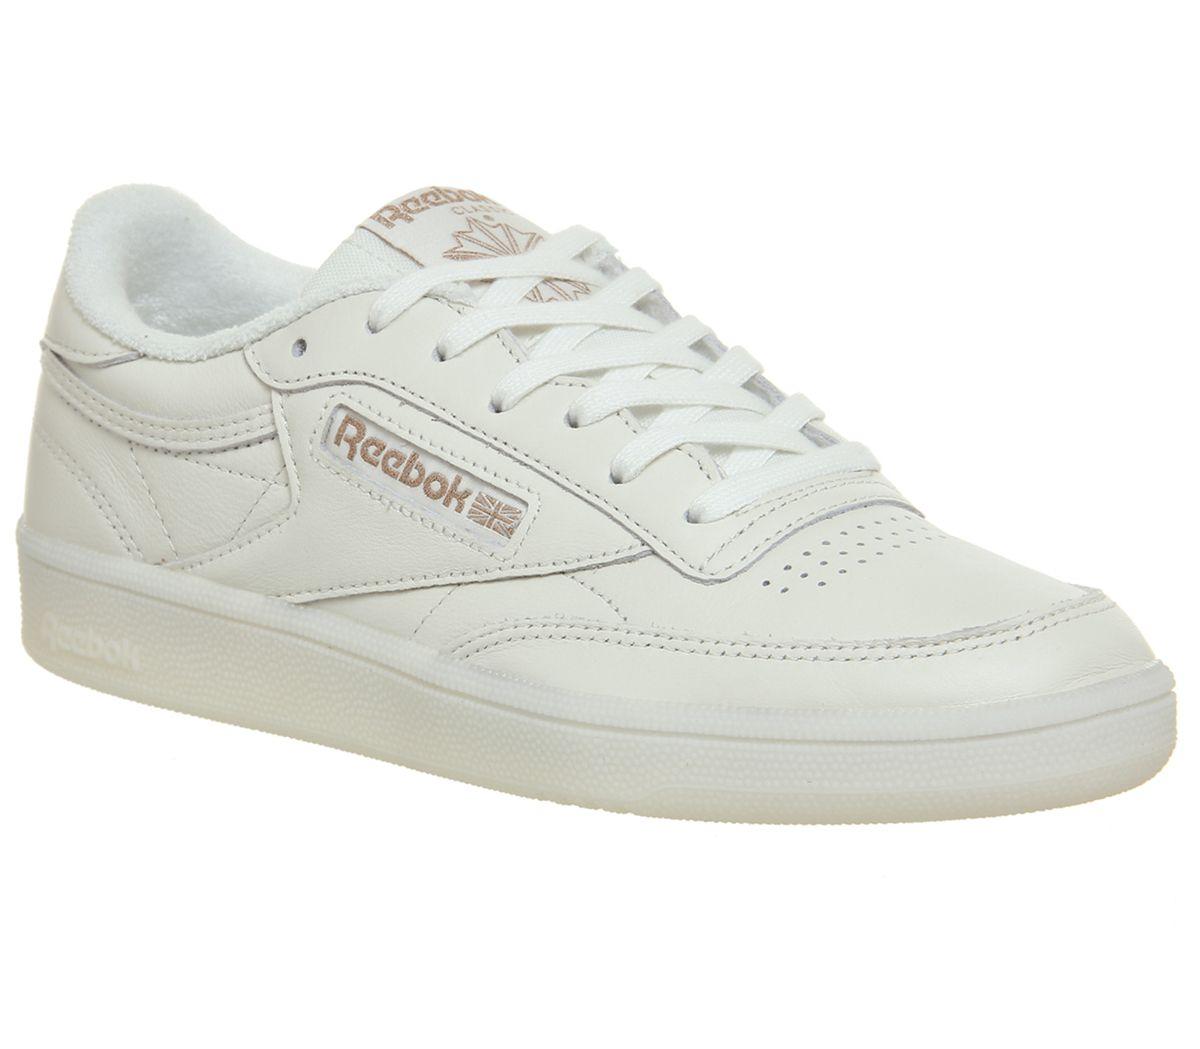 separation shoes 8938f d8df1 Club C 85 Trainers